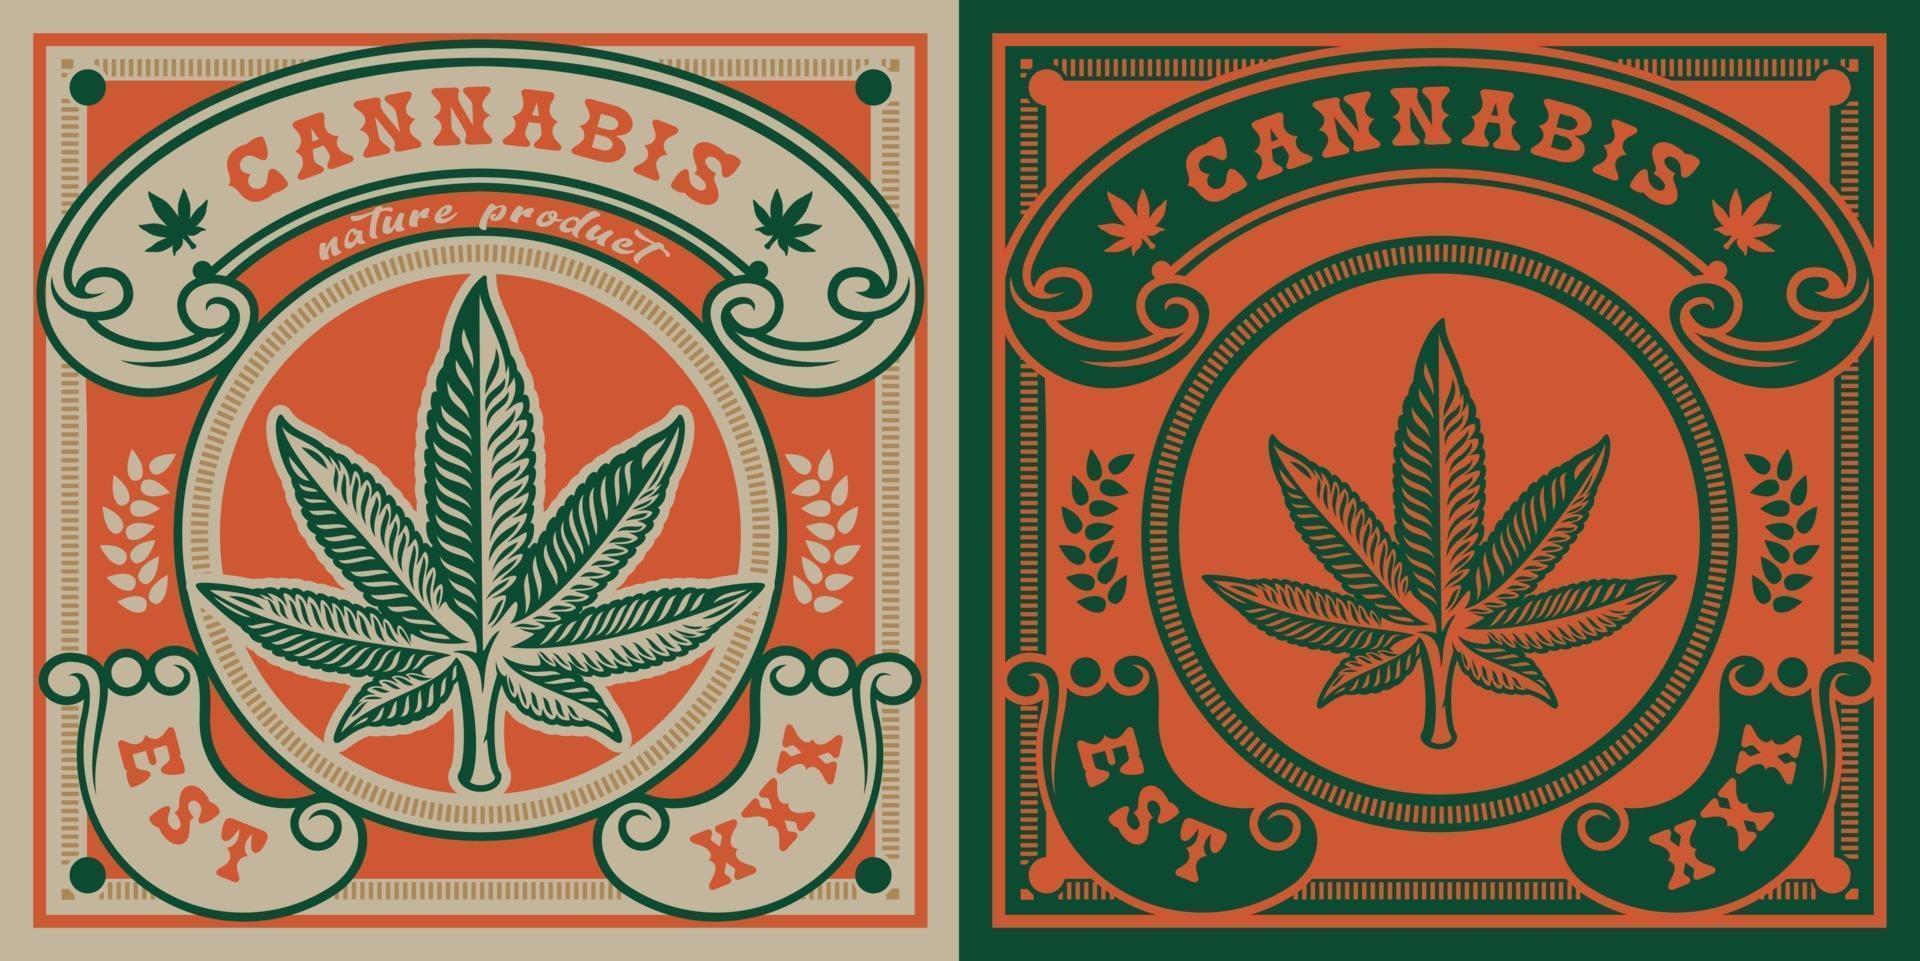 vektor emblem av cannabis blad